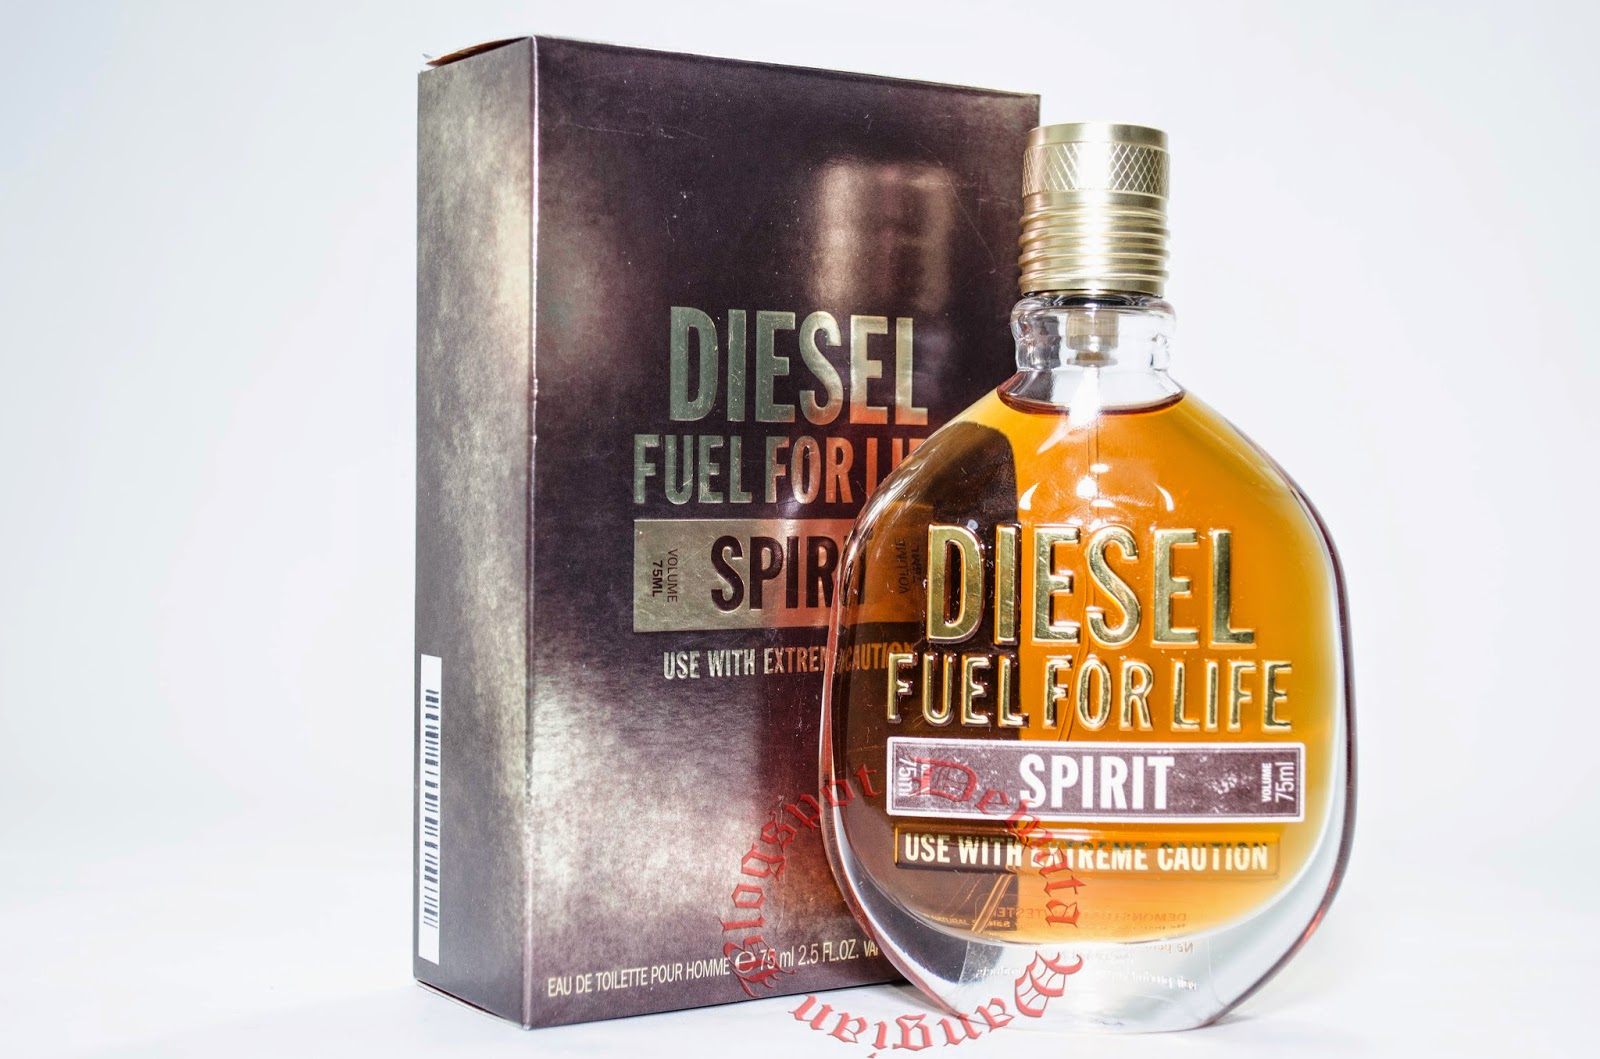 diesel fuel for life spirit tester perfume cosmetics. Black Bedroom Furniture Sets. Home Design Ideas